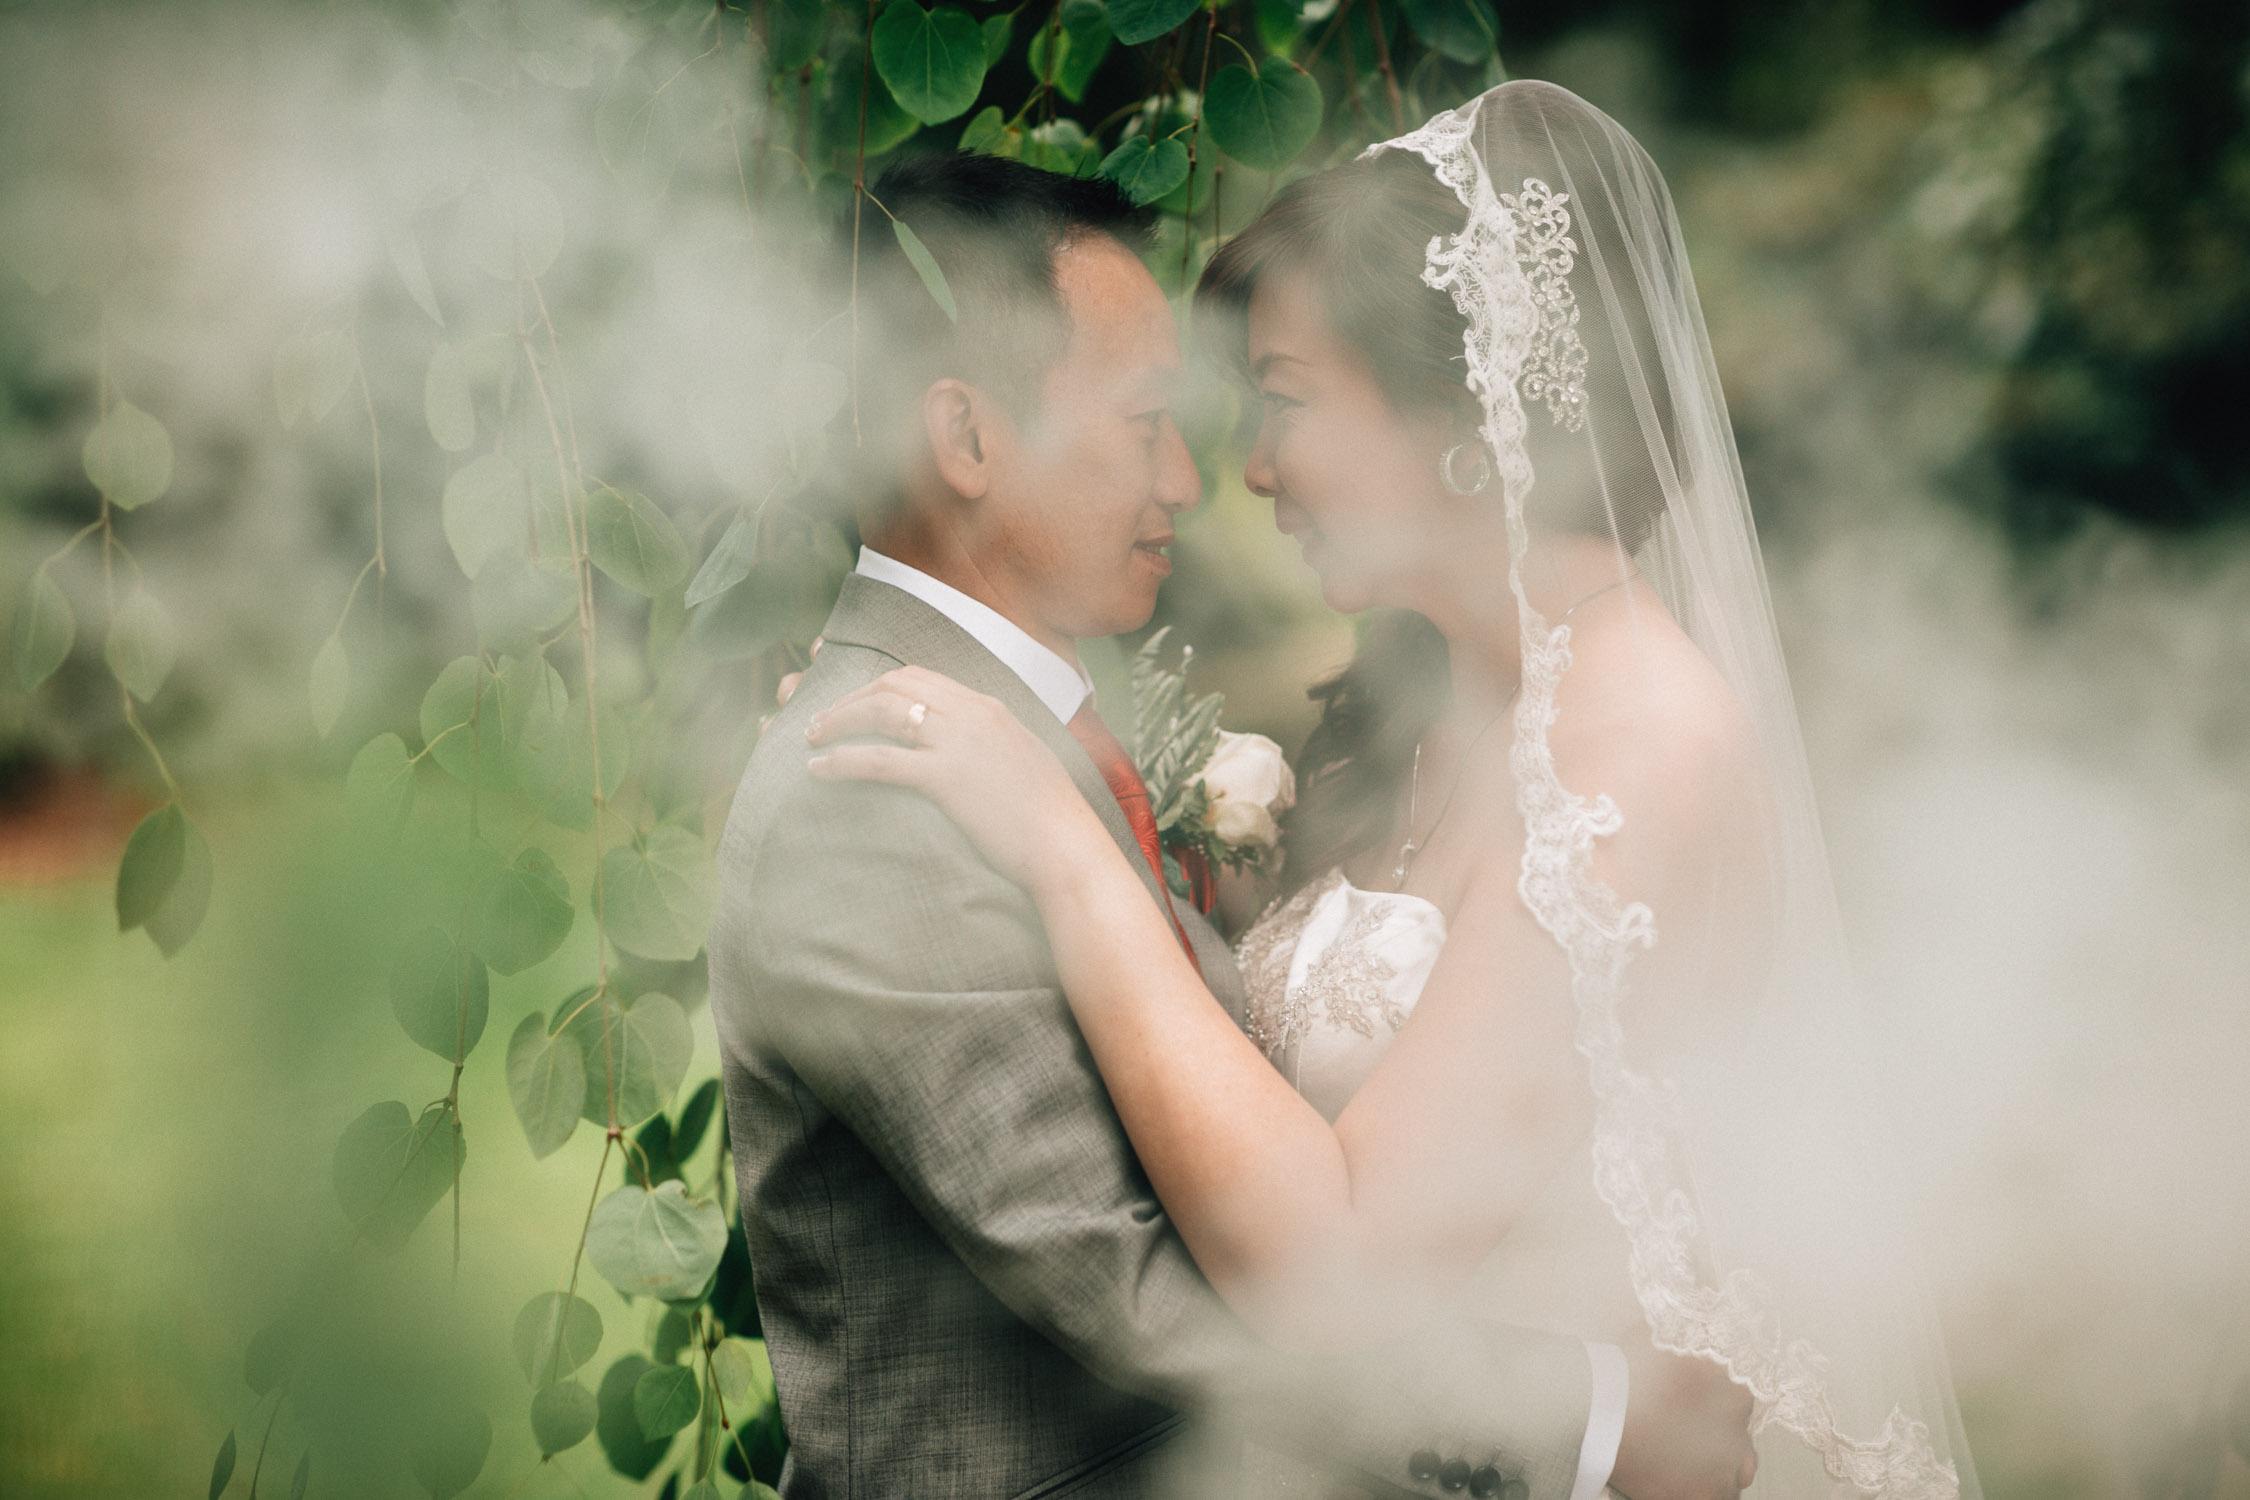 richmond wedding photographer at minoru park